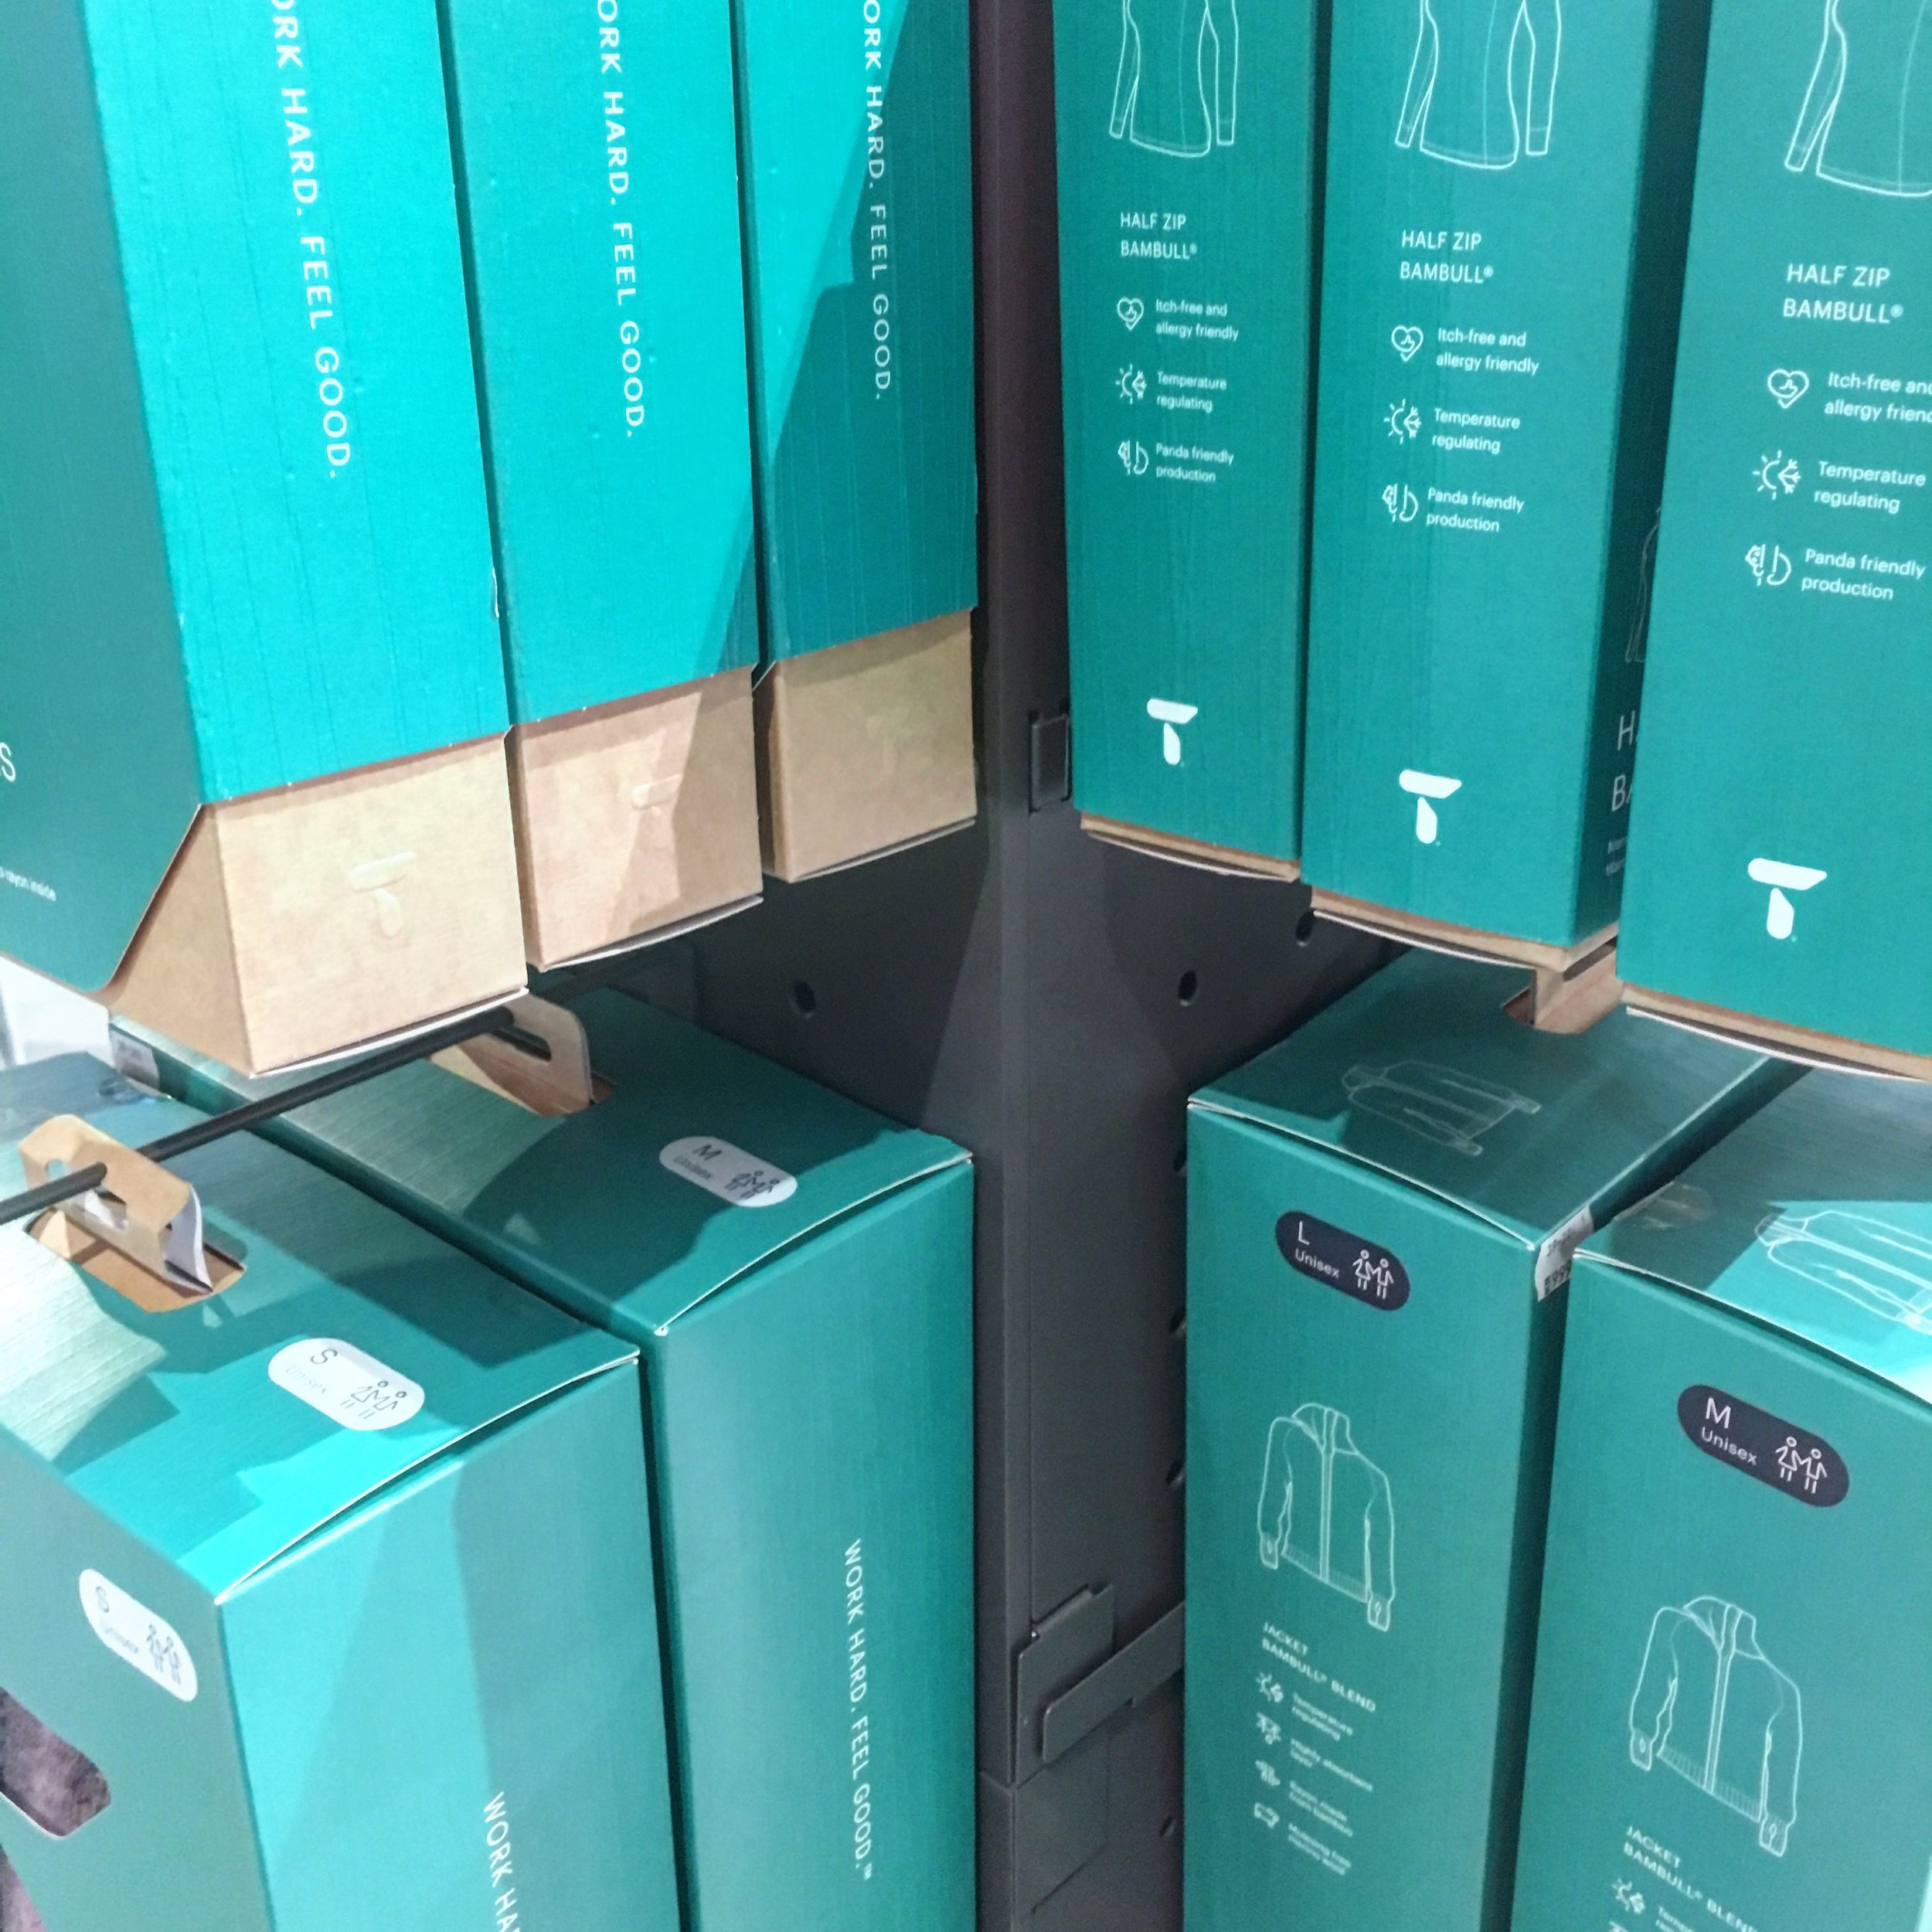 tufte-wear-point-of-sale-pivot-produktdesign.JPG